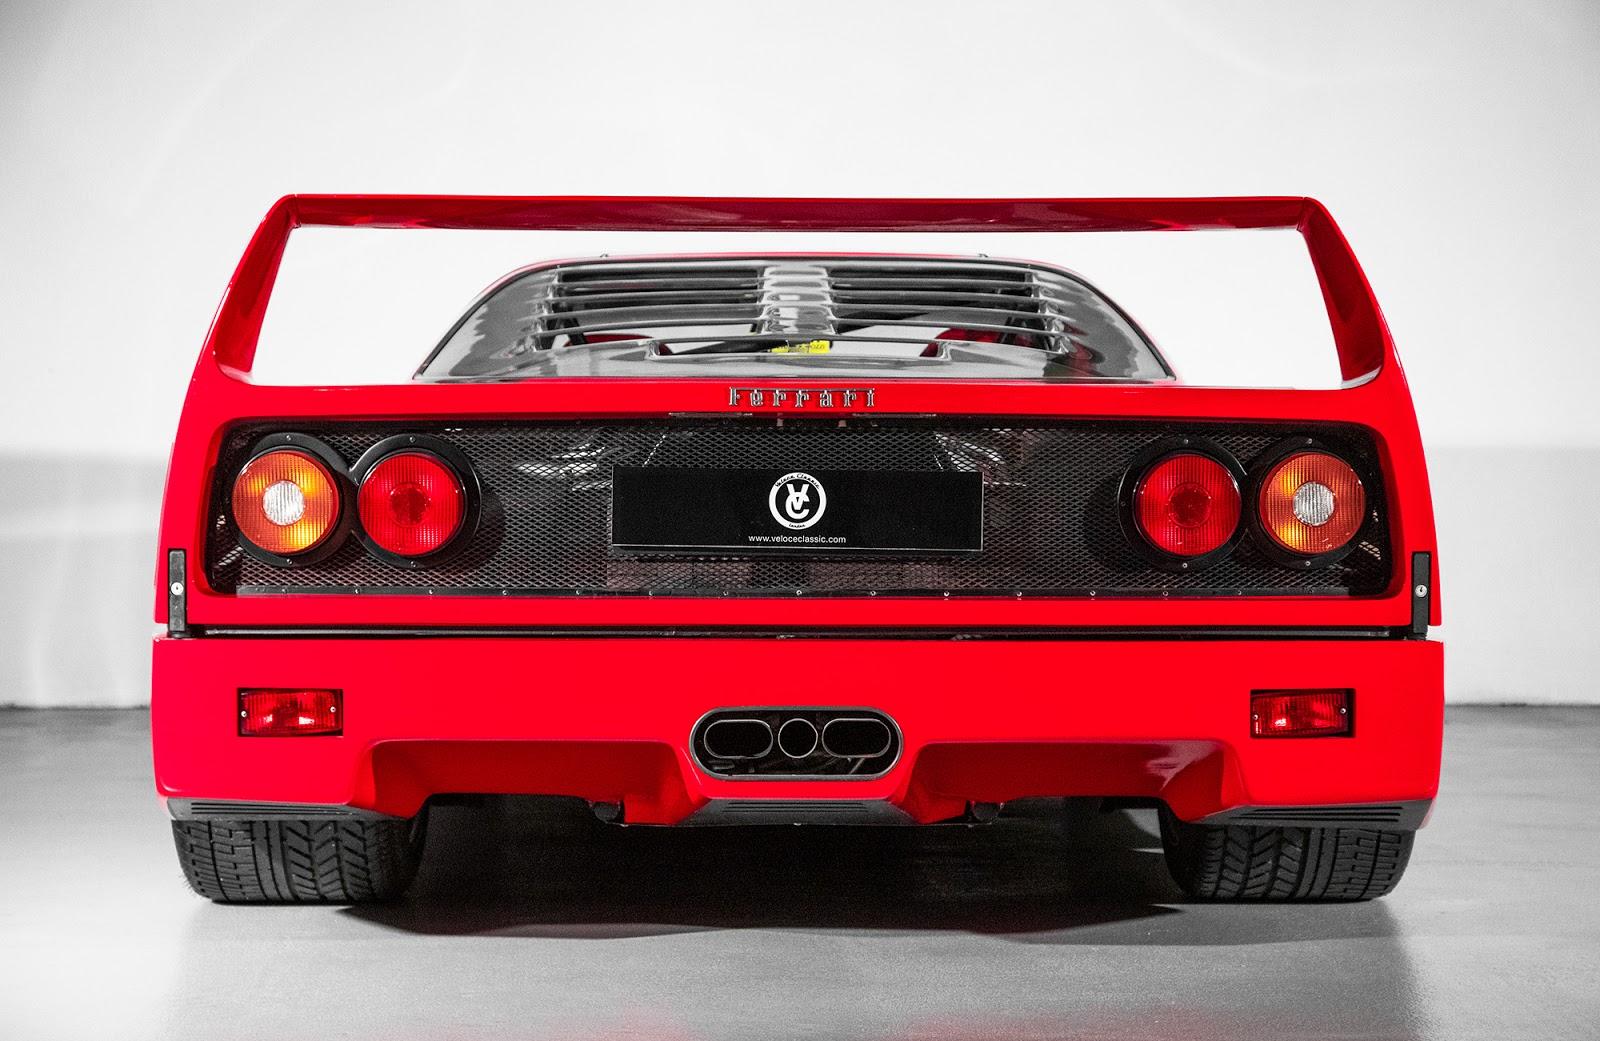 MK5 5092 F40. O μύθος, ο θρύλος F40, Ferrari, Ferrari F40, retrocar, retrocar sunday, zblog